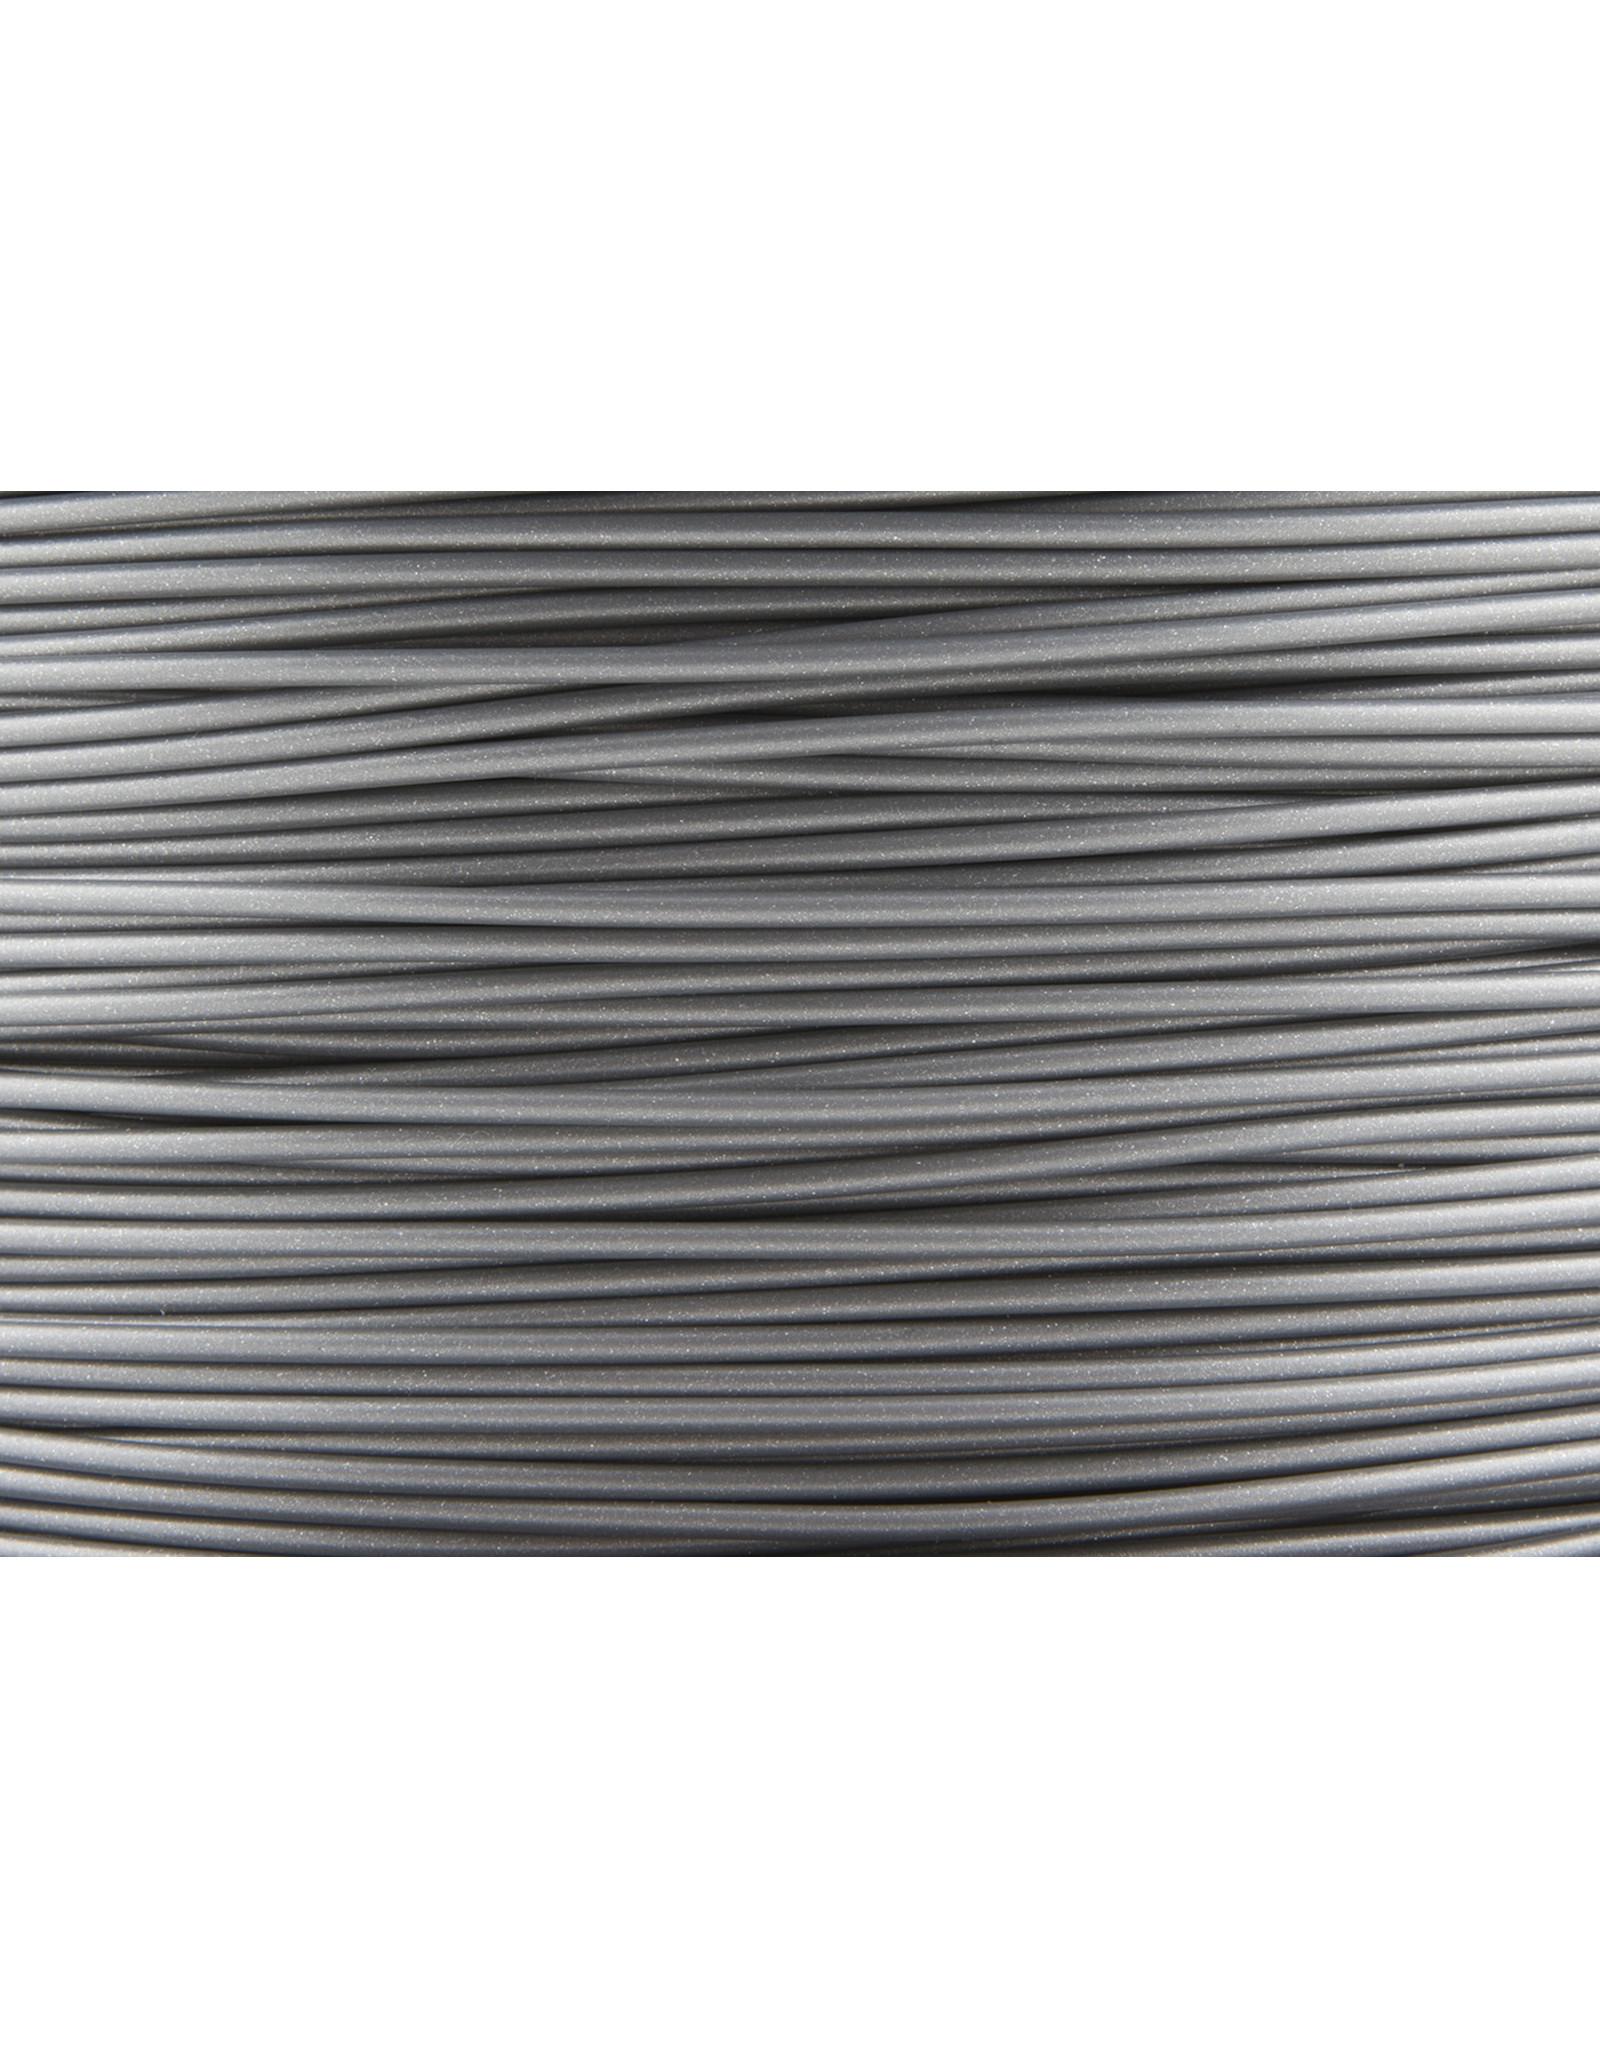 Prima PrimaValue PLA Filament 1.75mm 1 kg dark grey